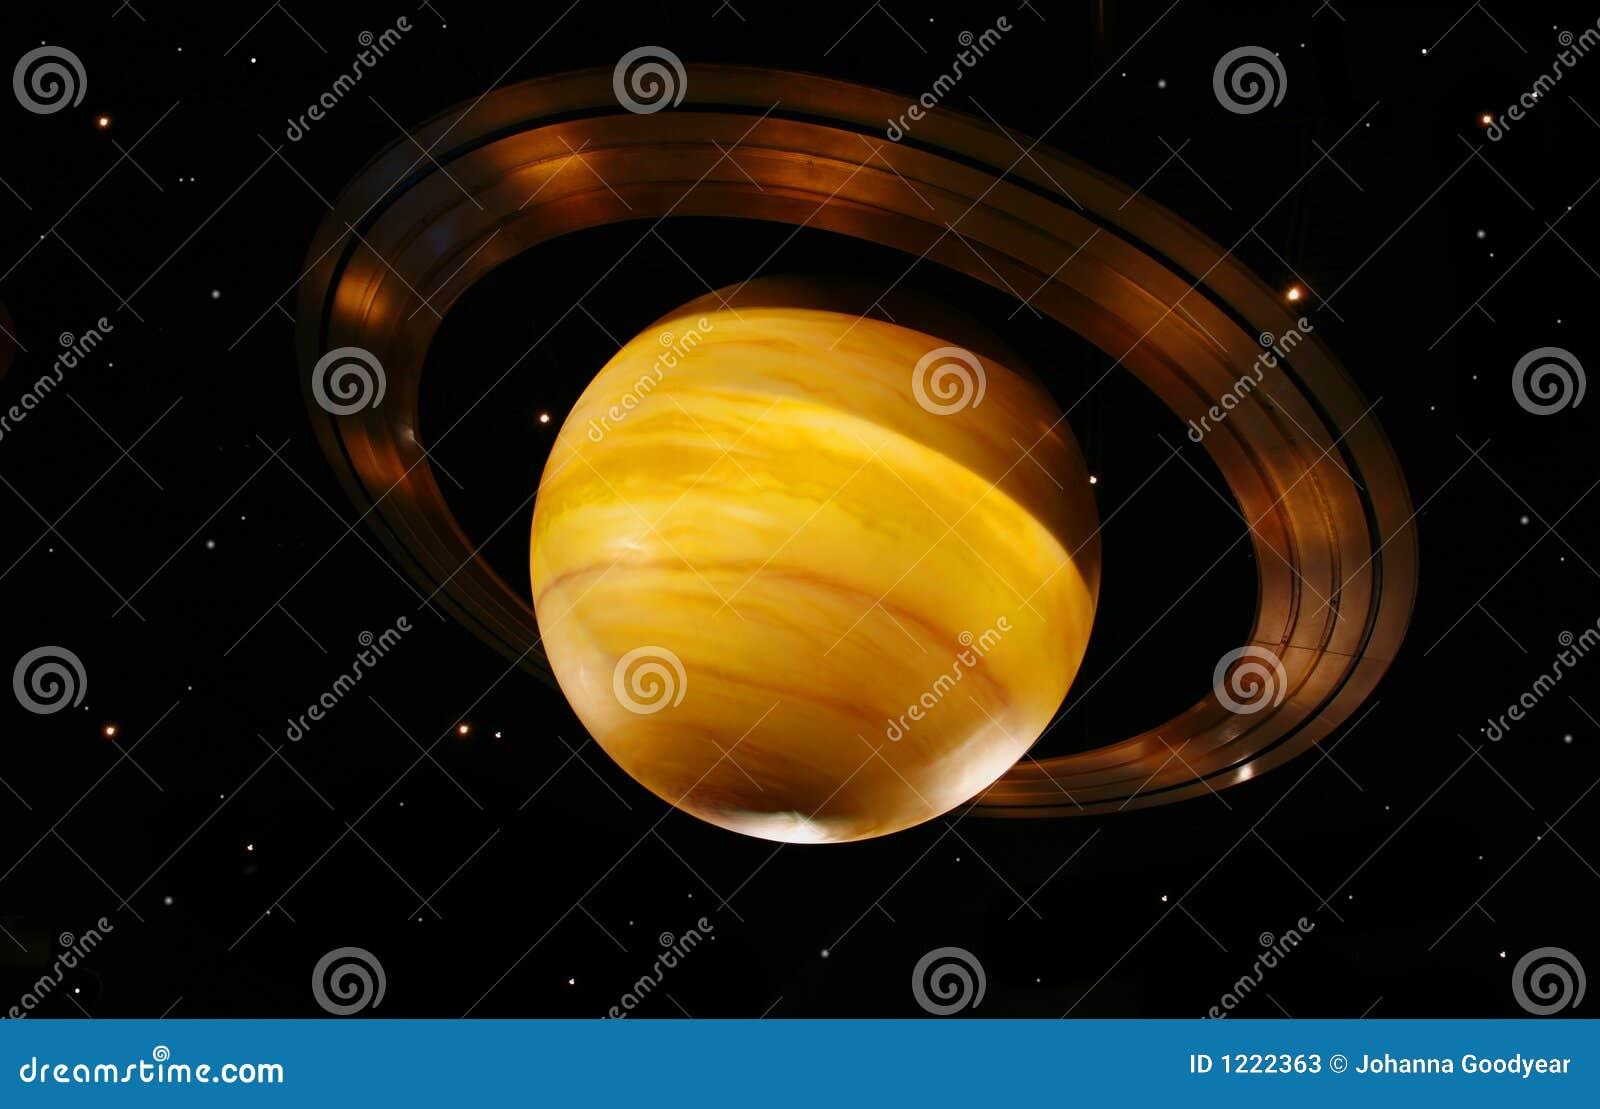 Something is. Uranus venus saturn acrylic dildo